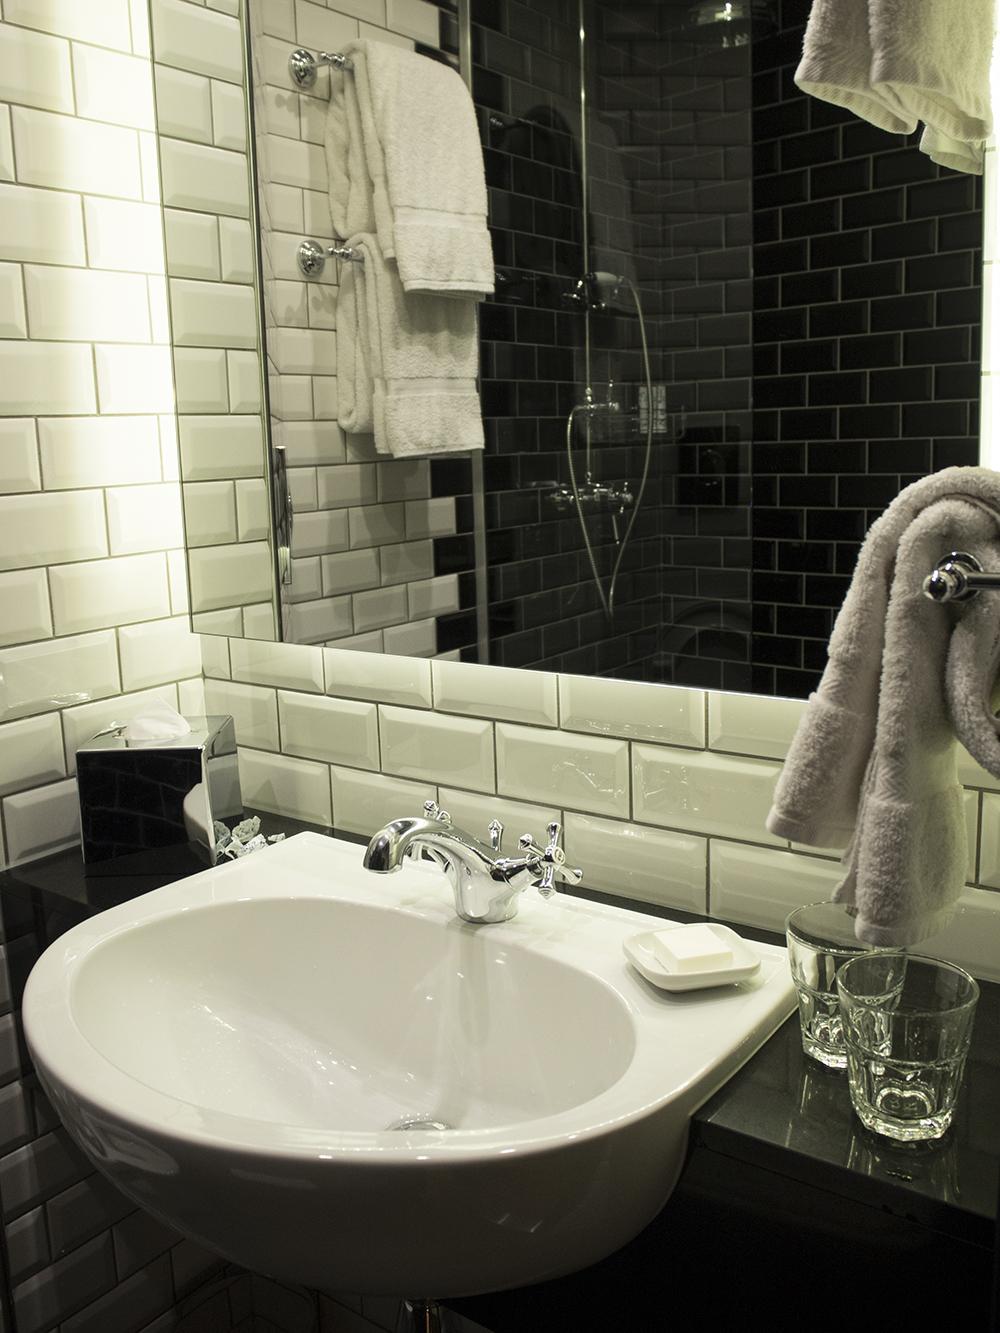 bathroom-hoxton-hotel-shoebox-room